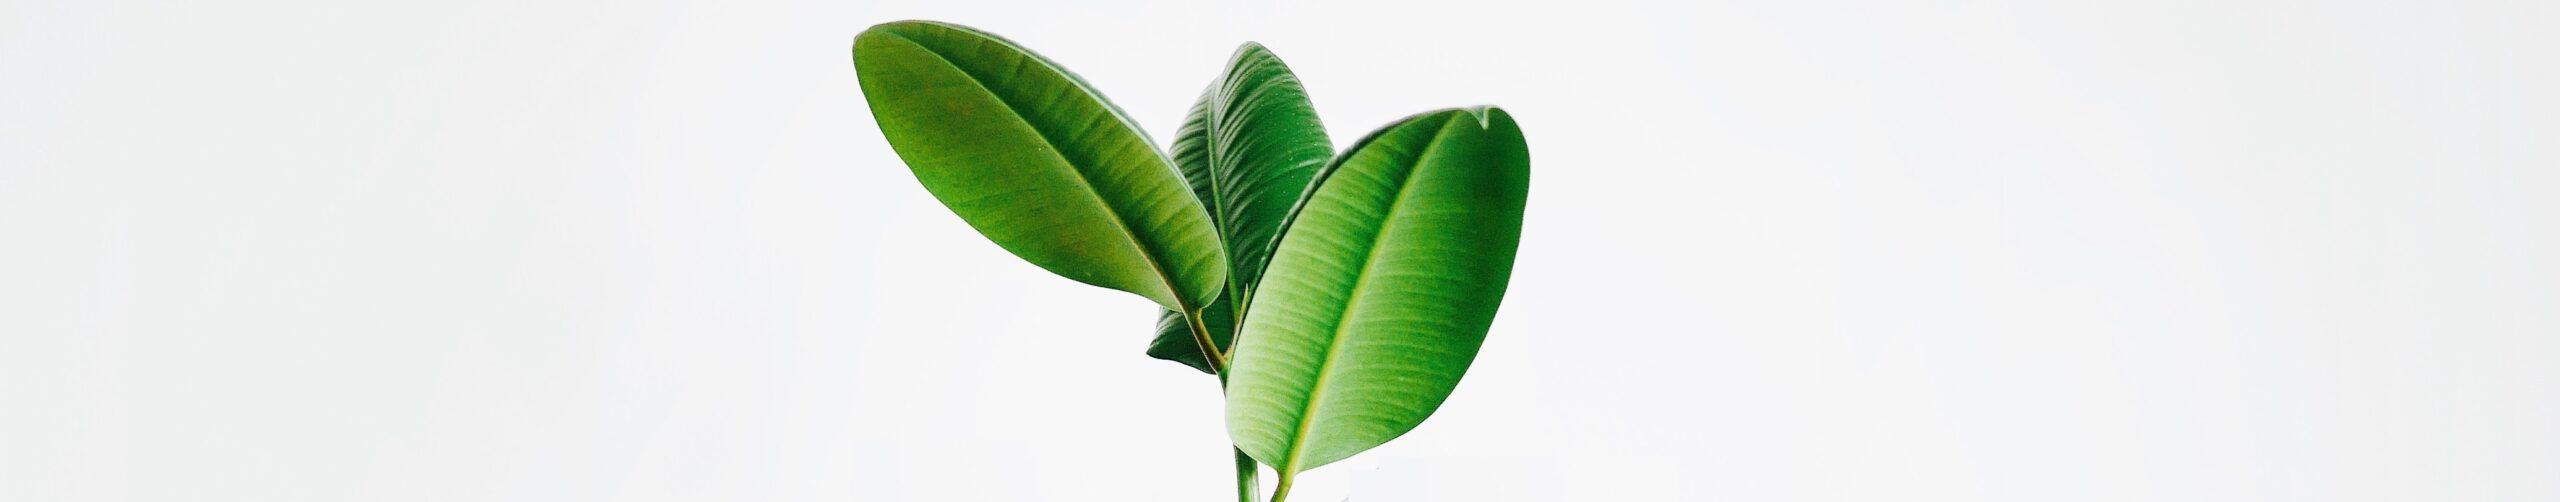 clean, green, plant-based, natural, vegan, skincare, clean beauty